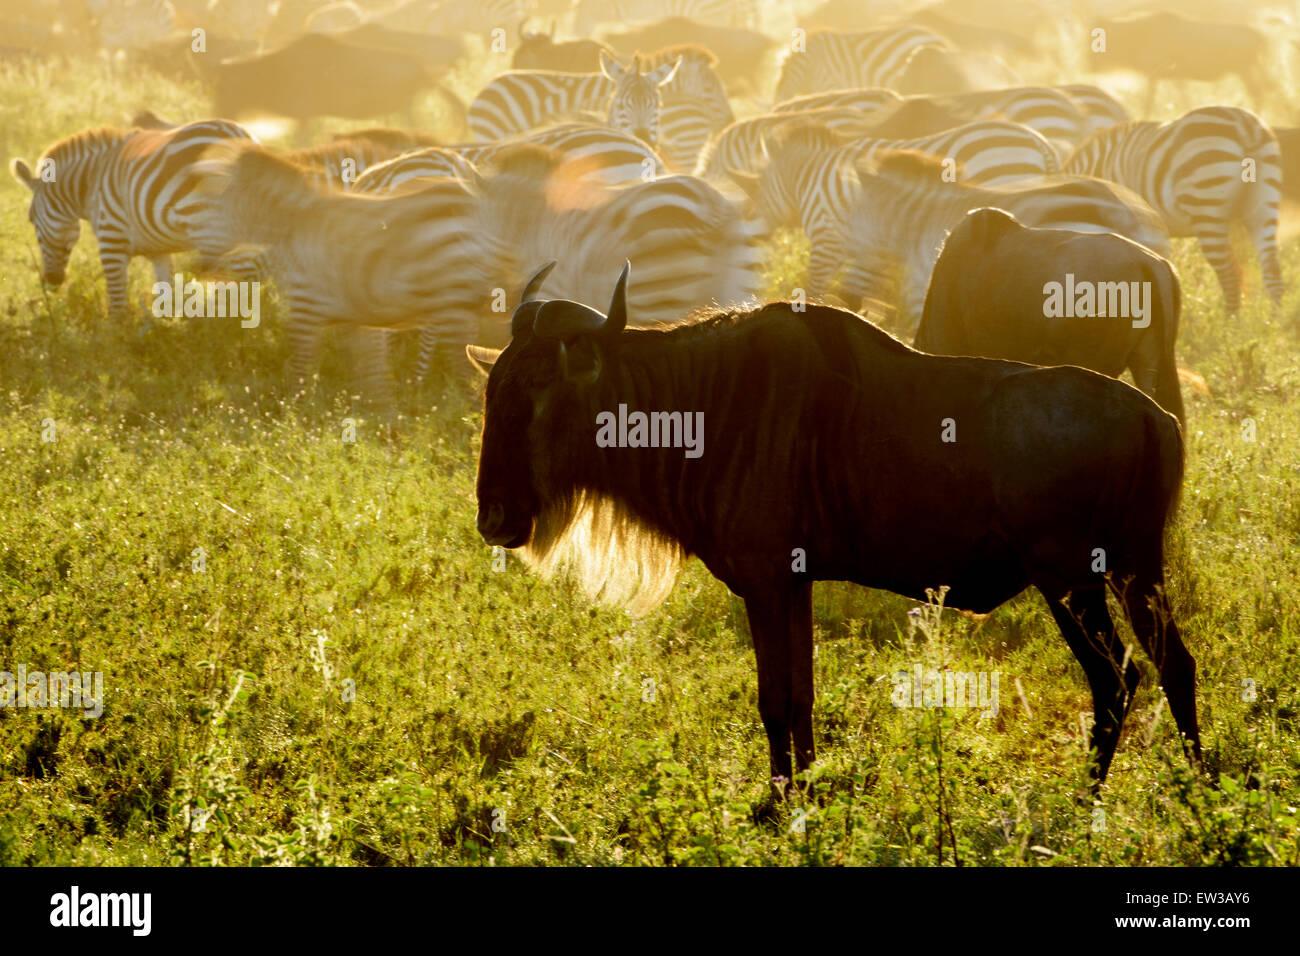 Wildebeests (Connochaetes taurinus) standing on savanna and plain zebra (Equus quagga) with motion blur, at sunrise, - Stock Image